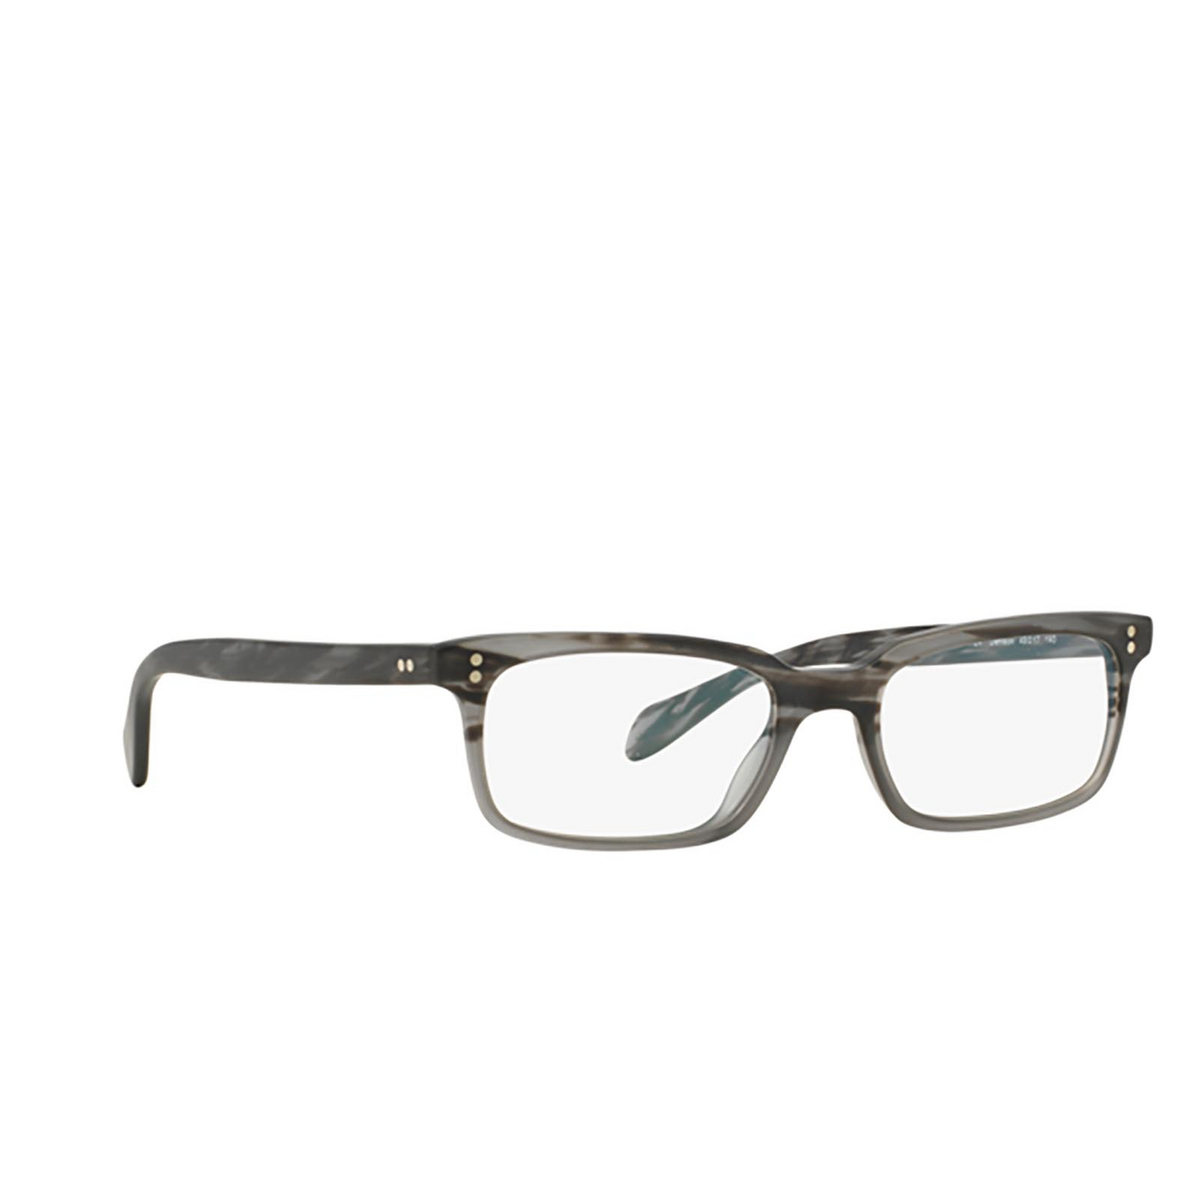 Oliver Peoples® Rectangle Eyeglasses: Denison OV5102 color Matte Storm 1124 - three-quarters view.